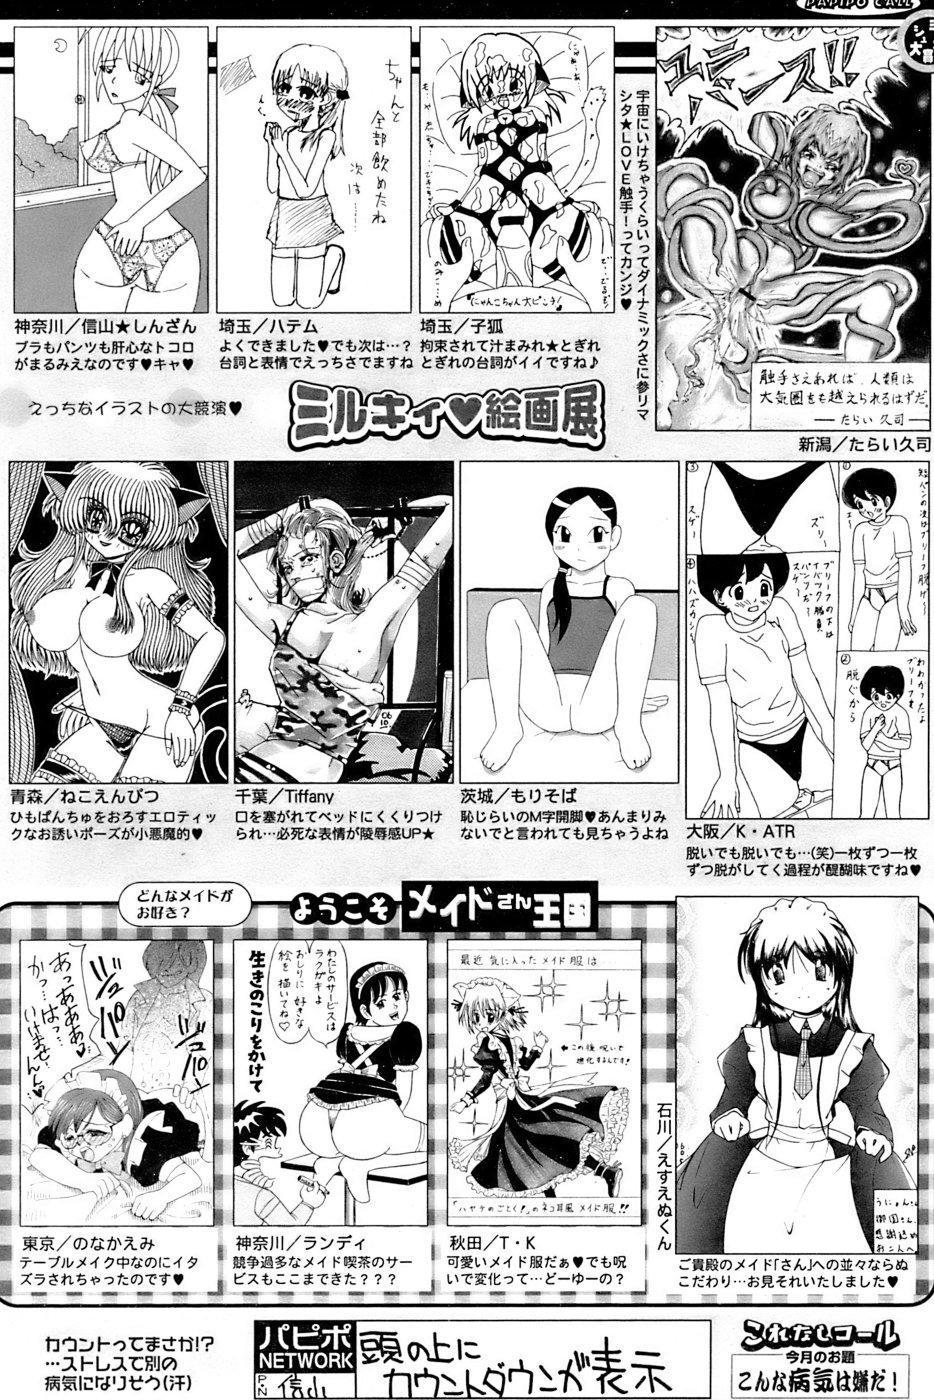 Comic Papipo 2007-01 253